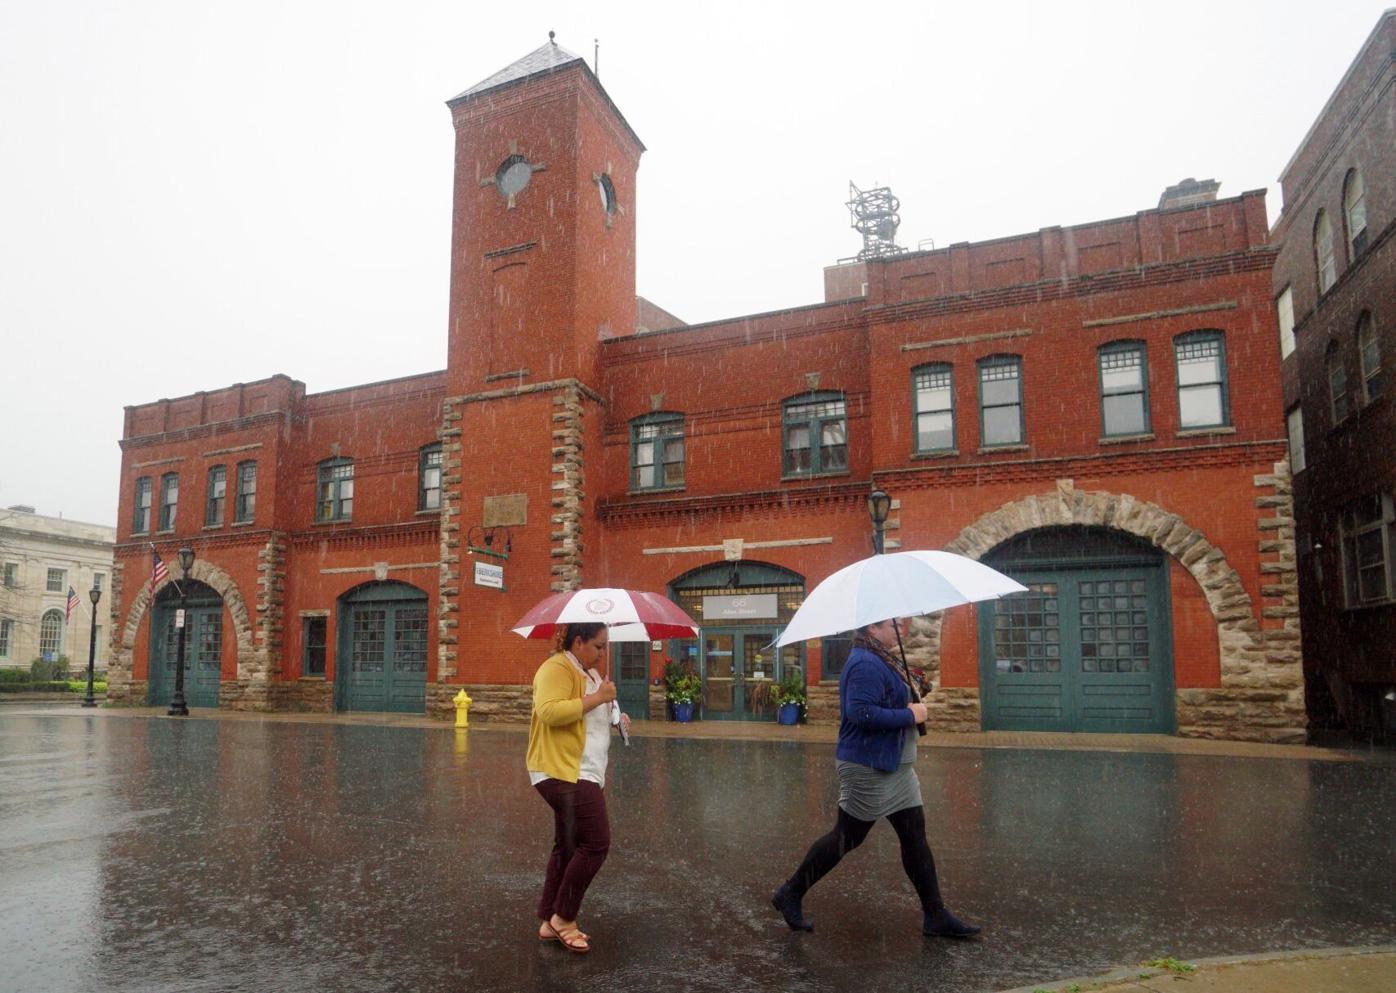 Two women walking with umbrellas in rain (copy)